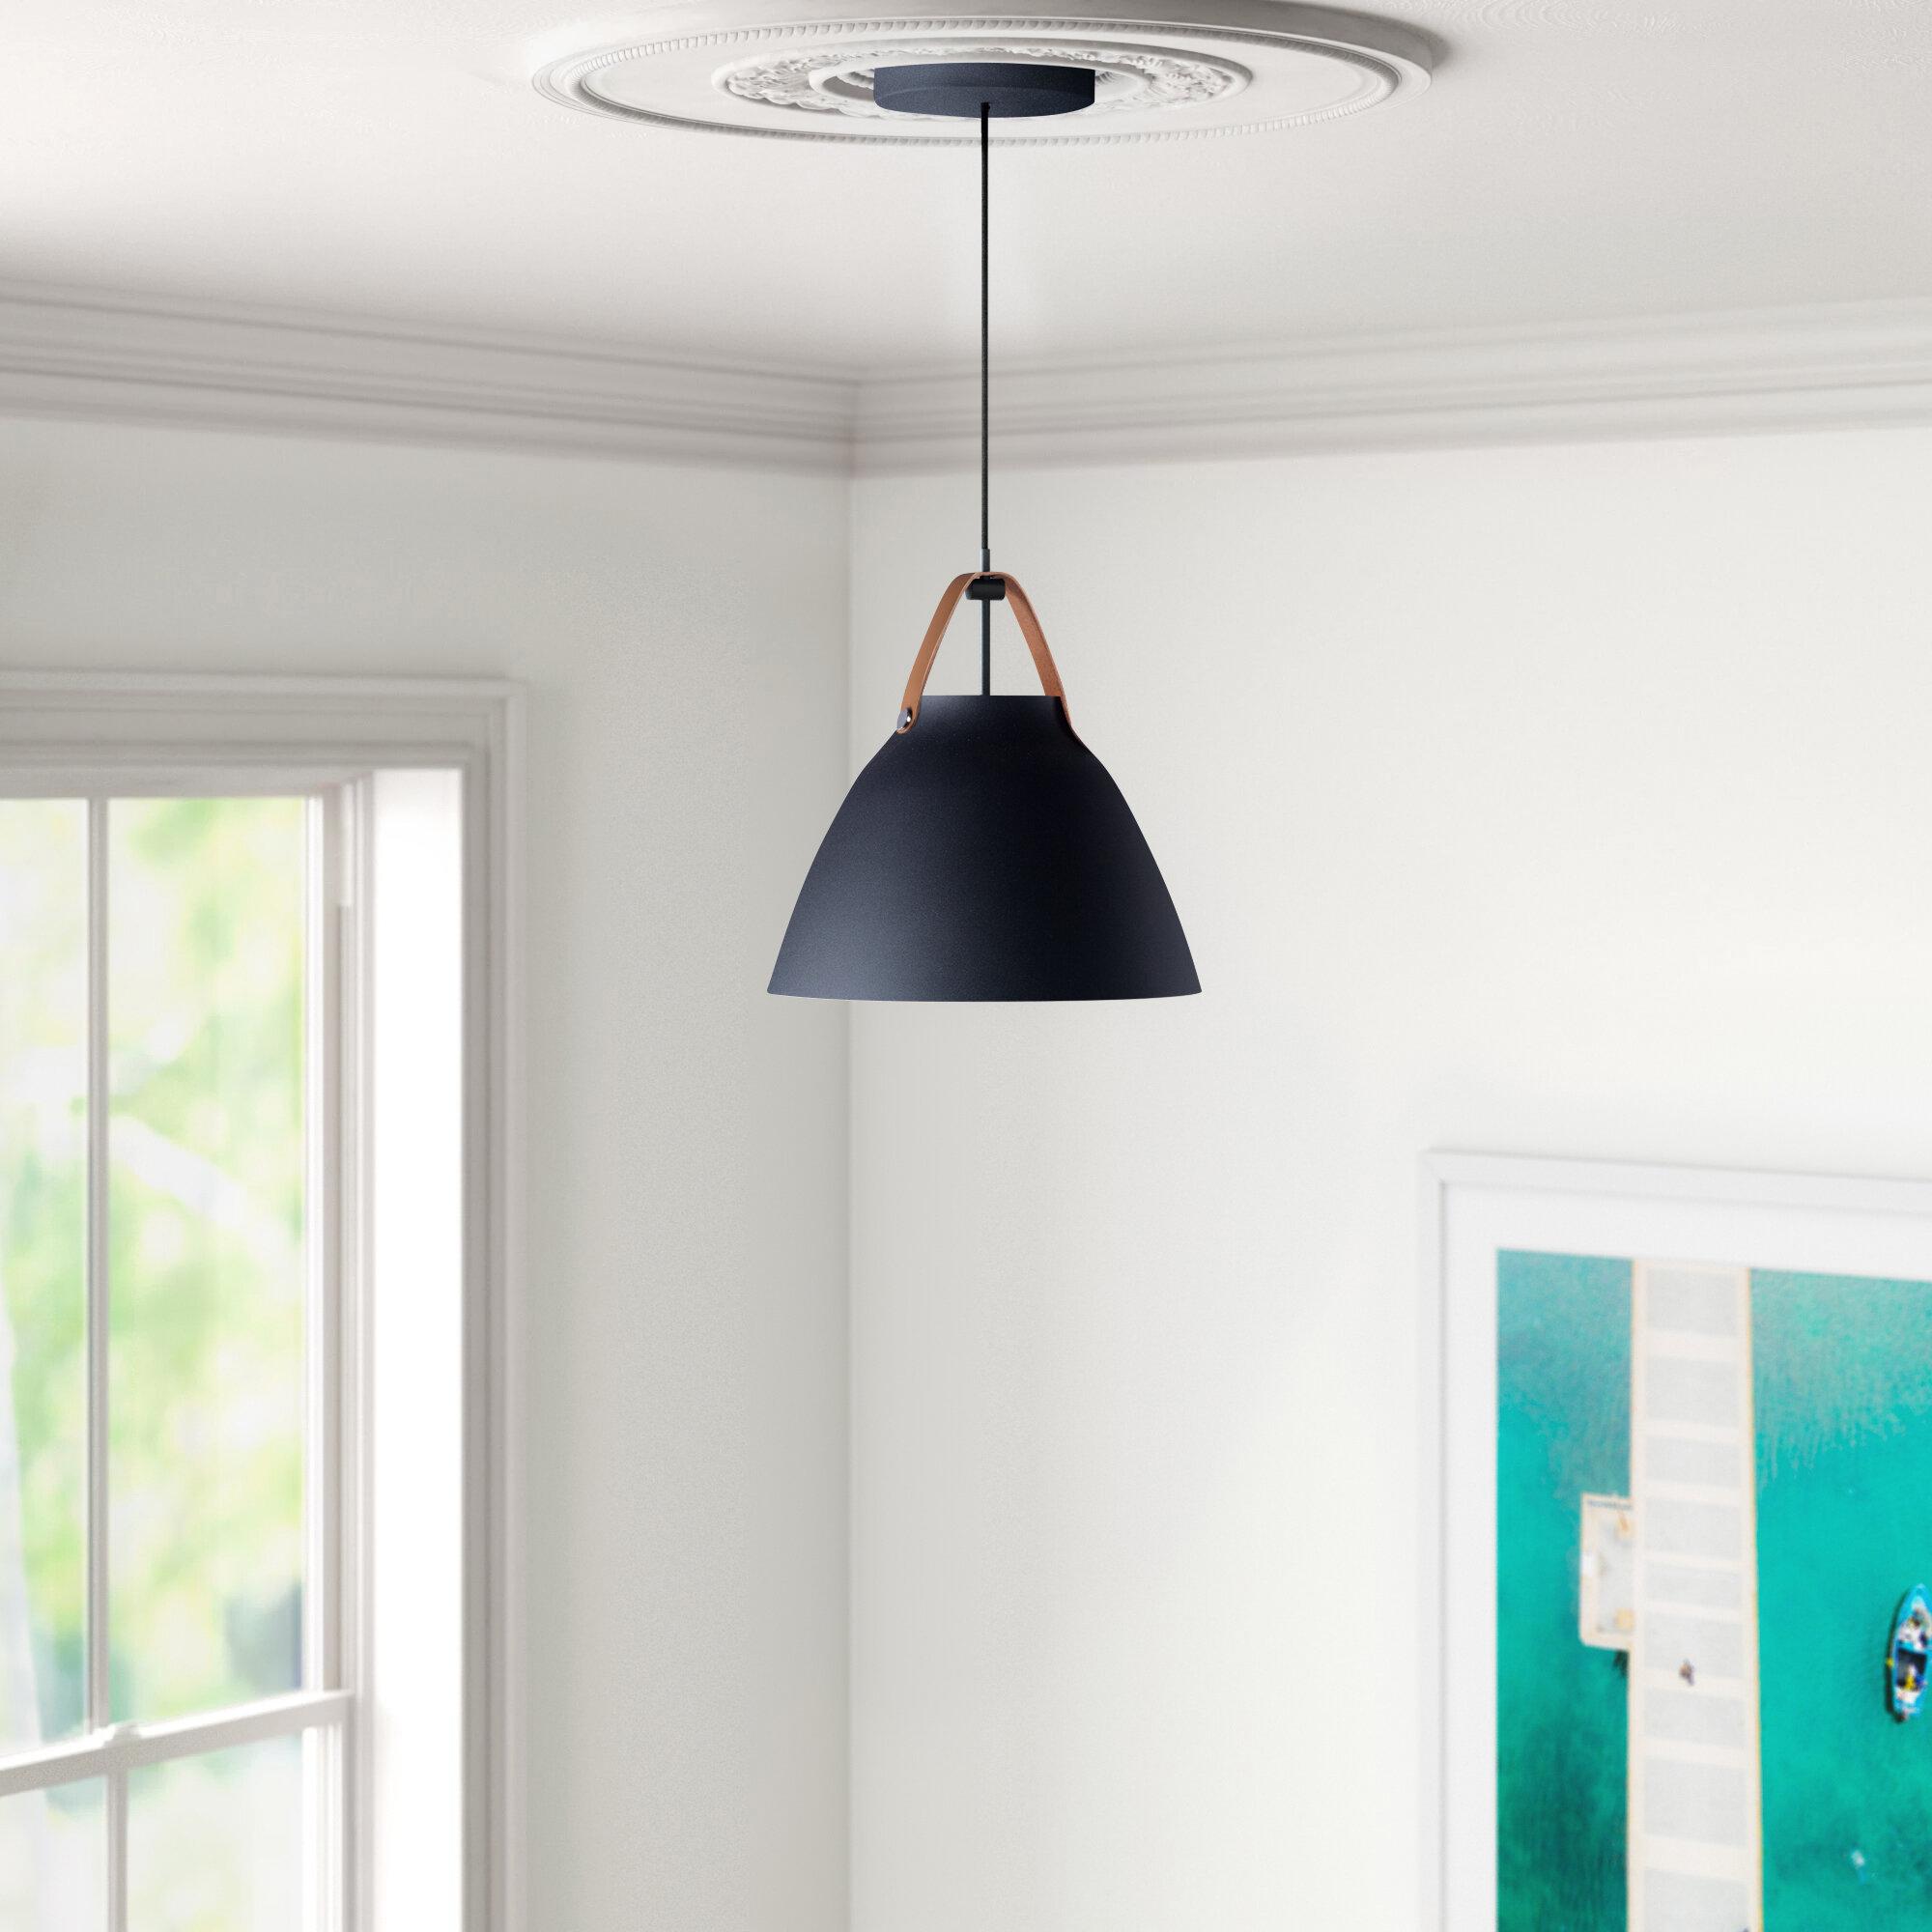 Faust 1 Light Single Dome Pendant Reviews Allmodern